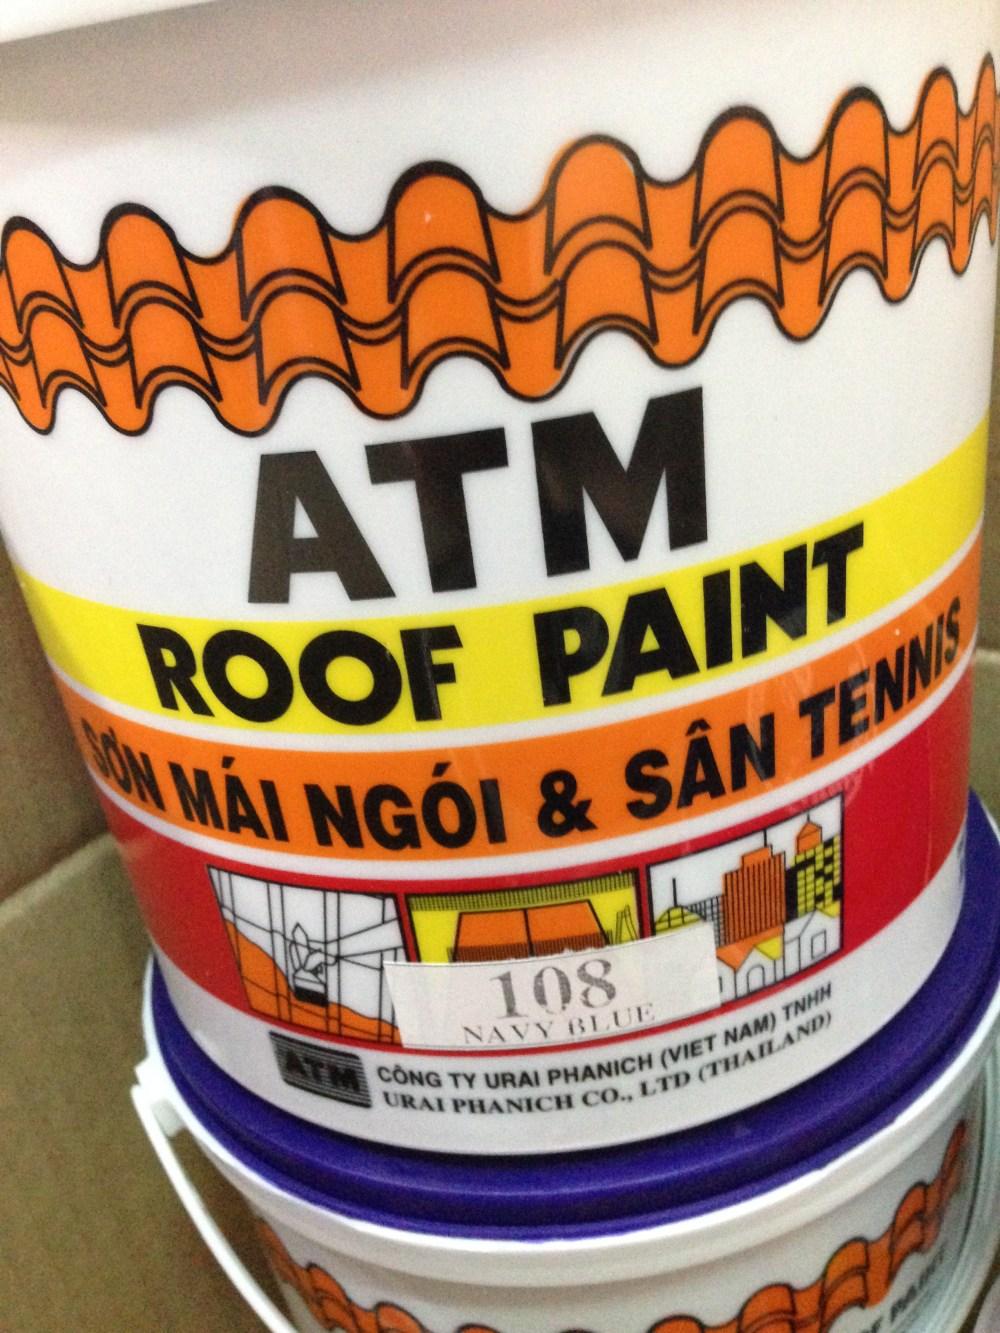 ATM roofpaint (4)